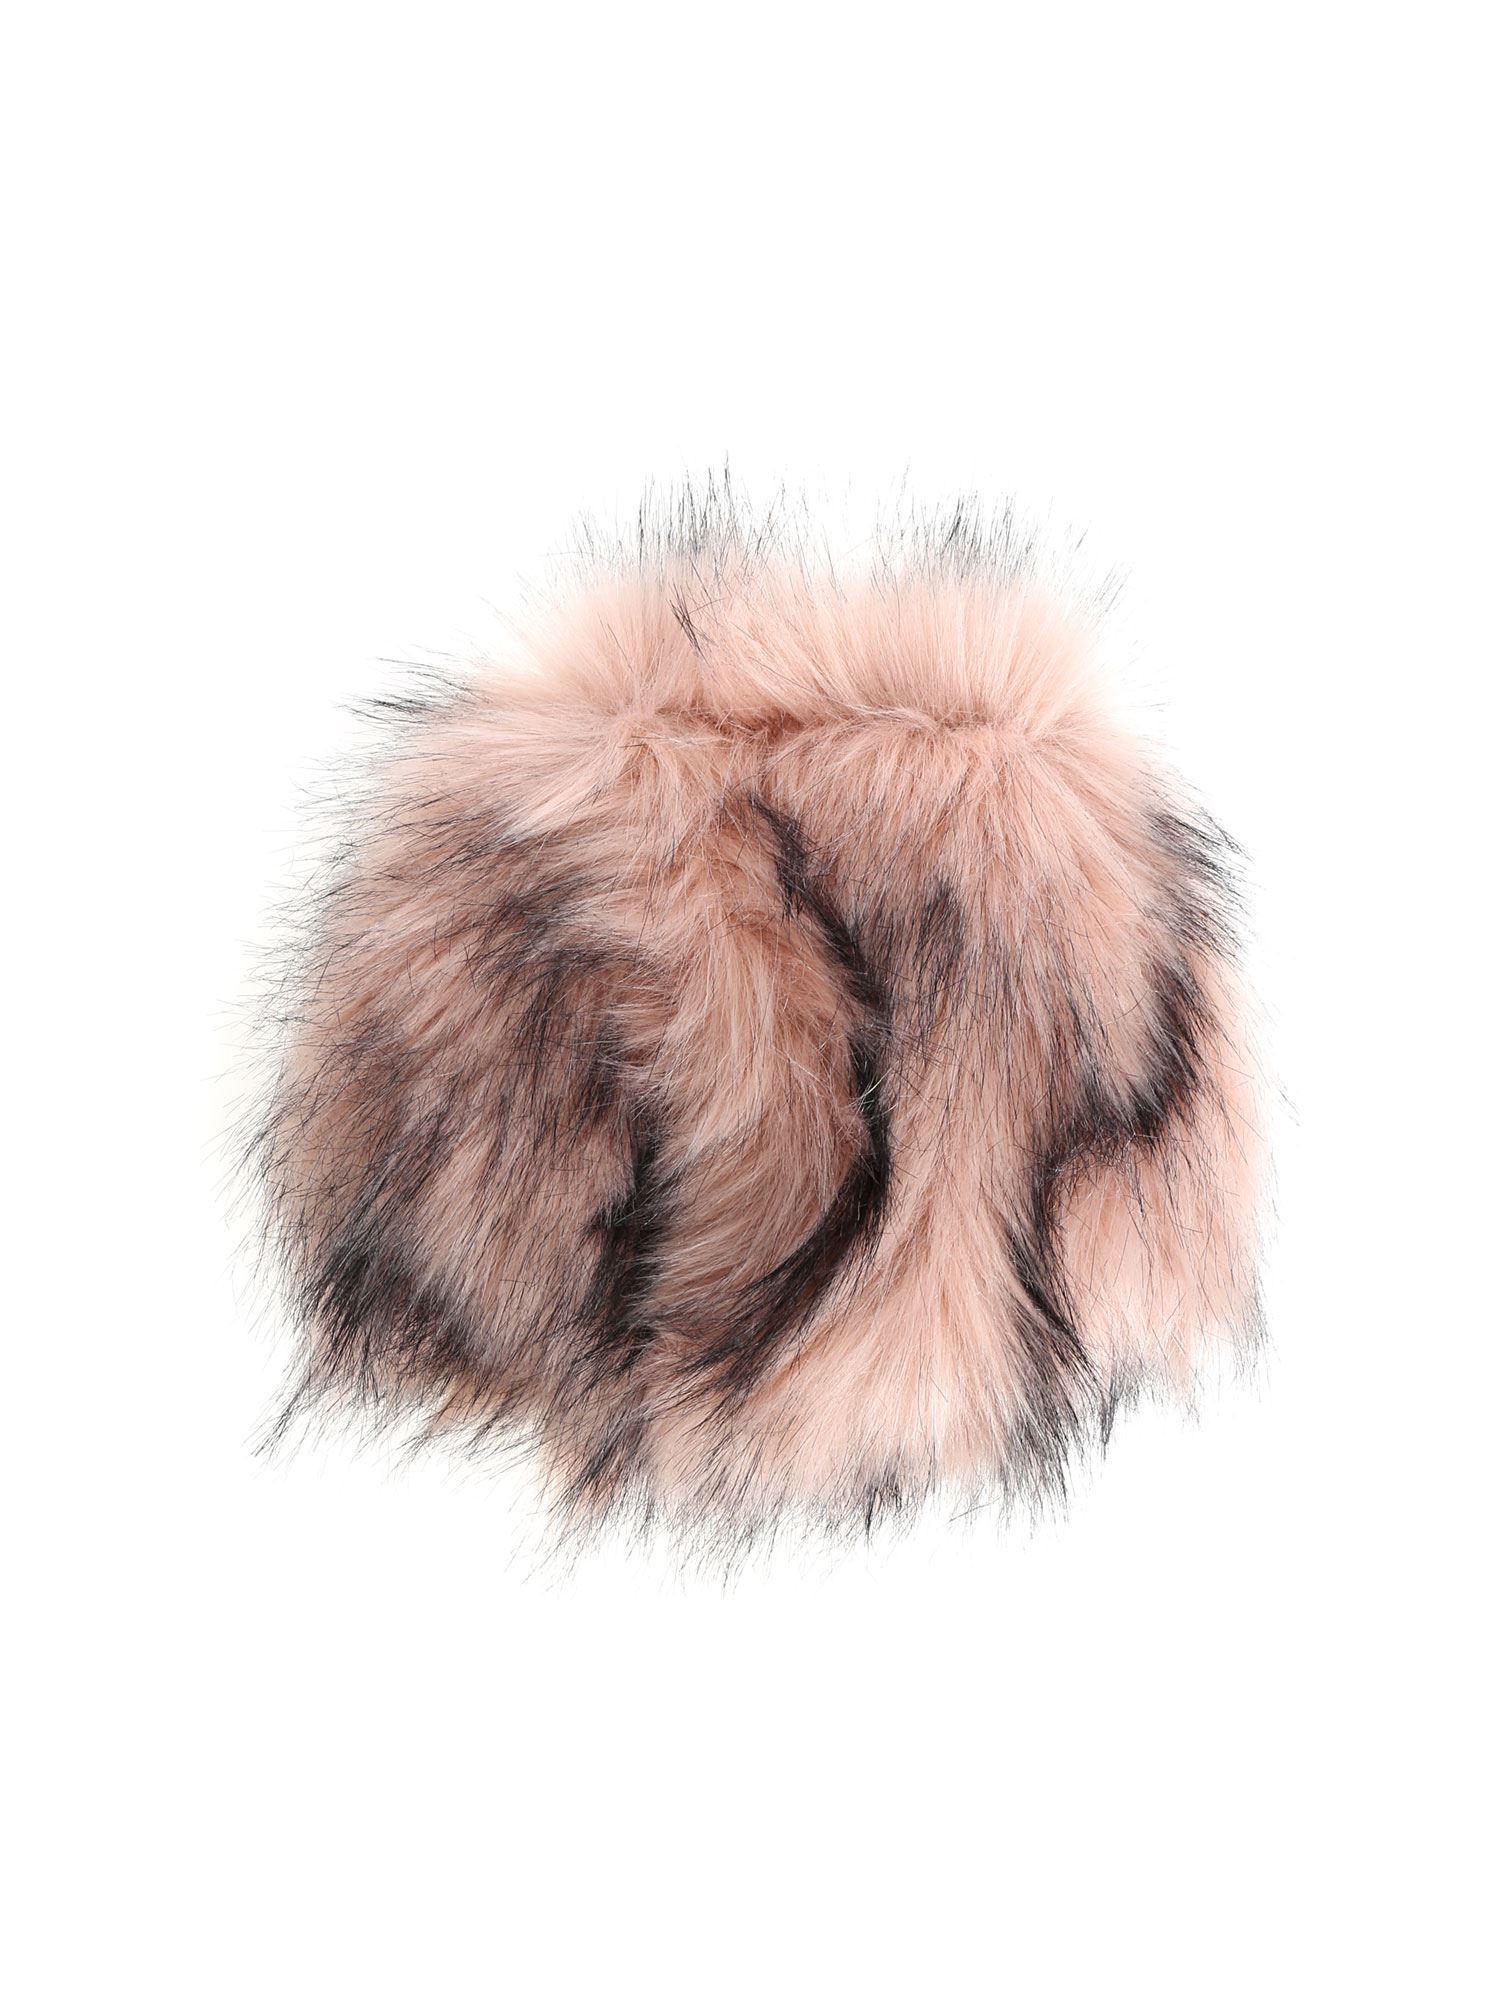 6613eb3380d Lyst - L Autre Chose Pink And Black Faux Fur Hat in Pink